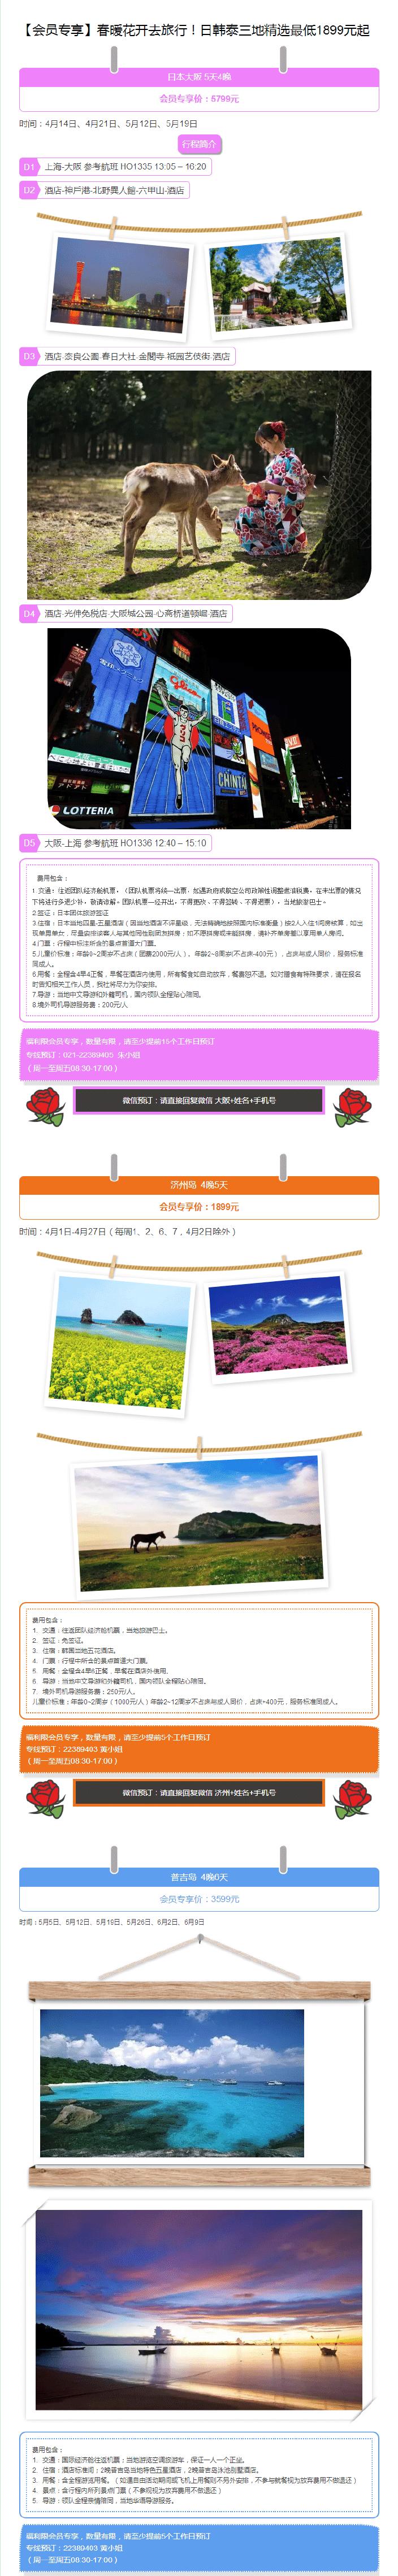 C:\Users\zhanghao1\Desktop\【会员专享】春暖花开去旅行!日韩泰三地精选最低1899元起副本 (1).png